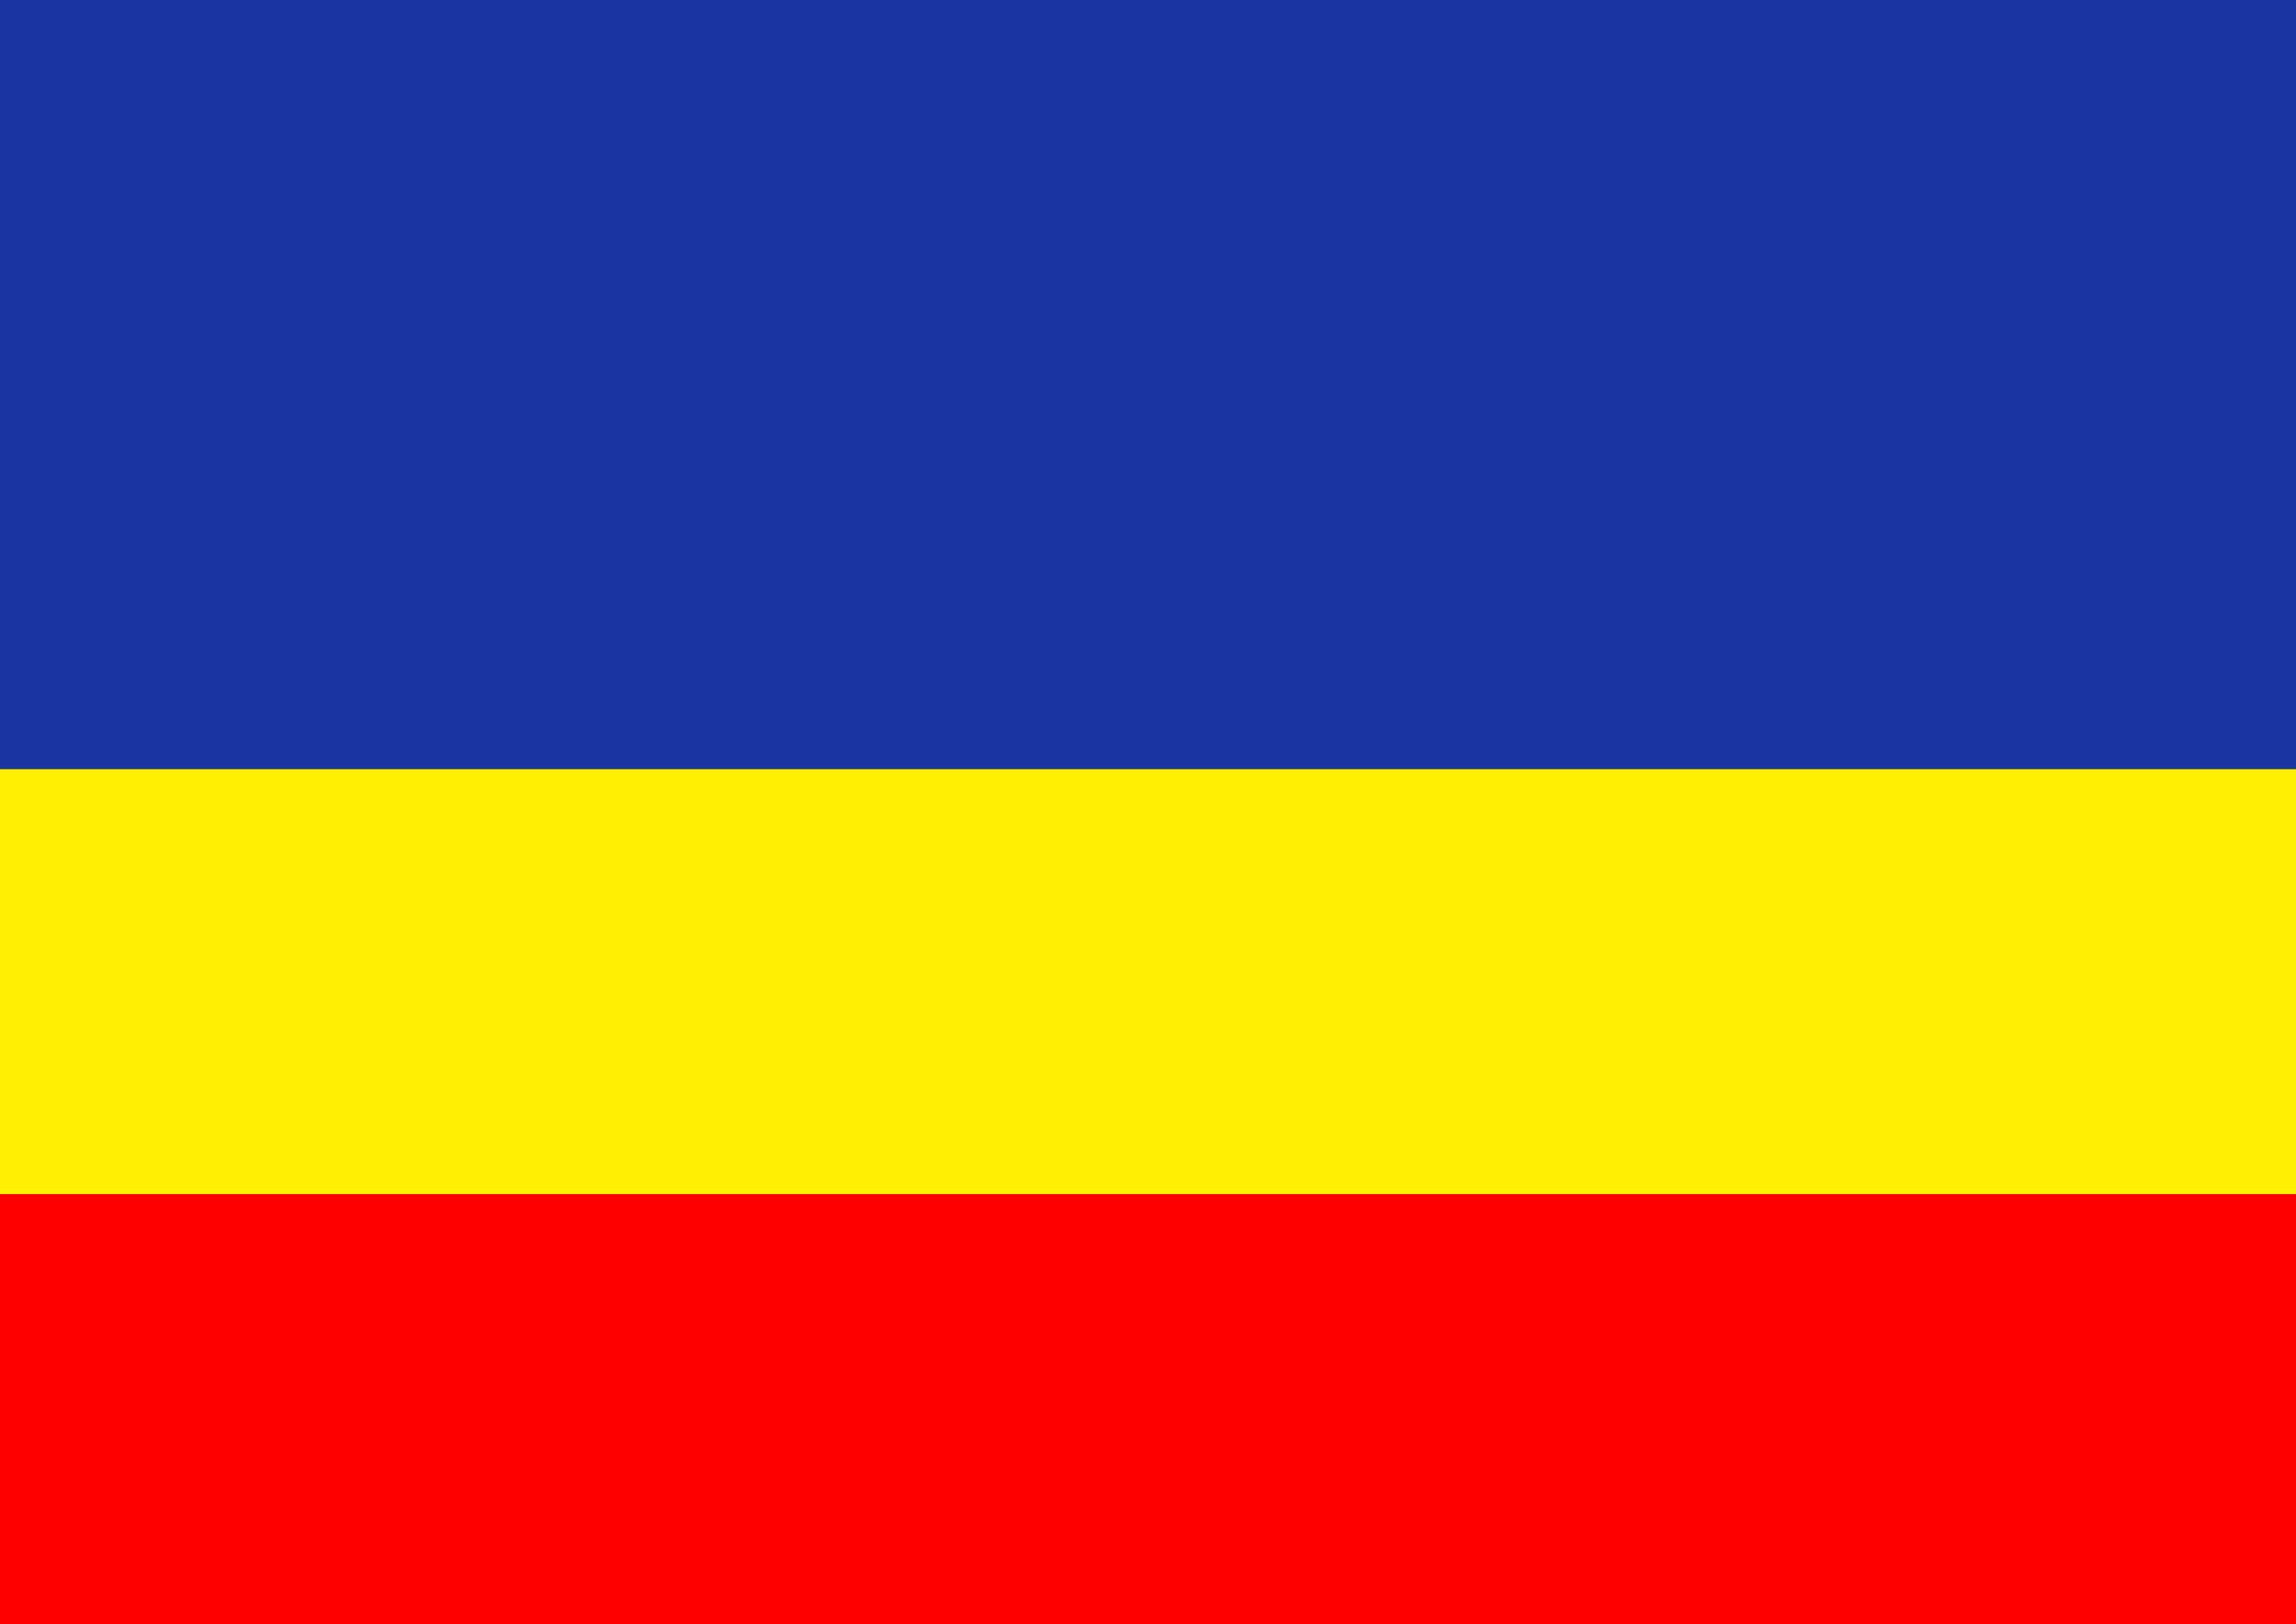 Flaga Ursynowa